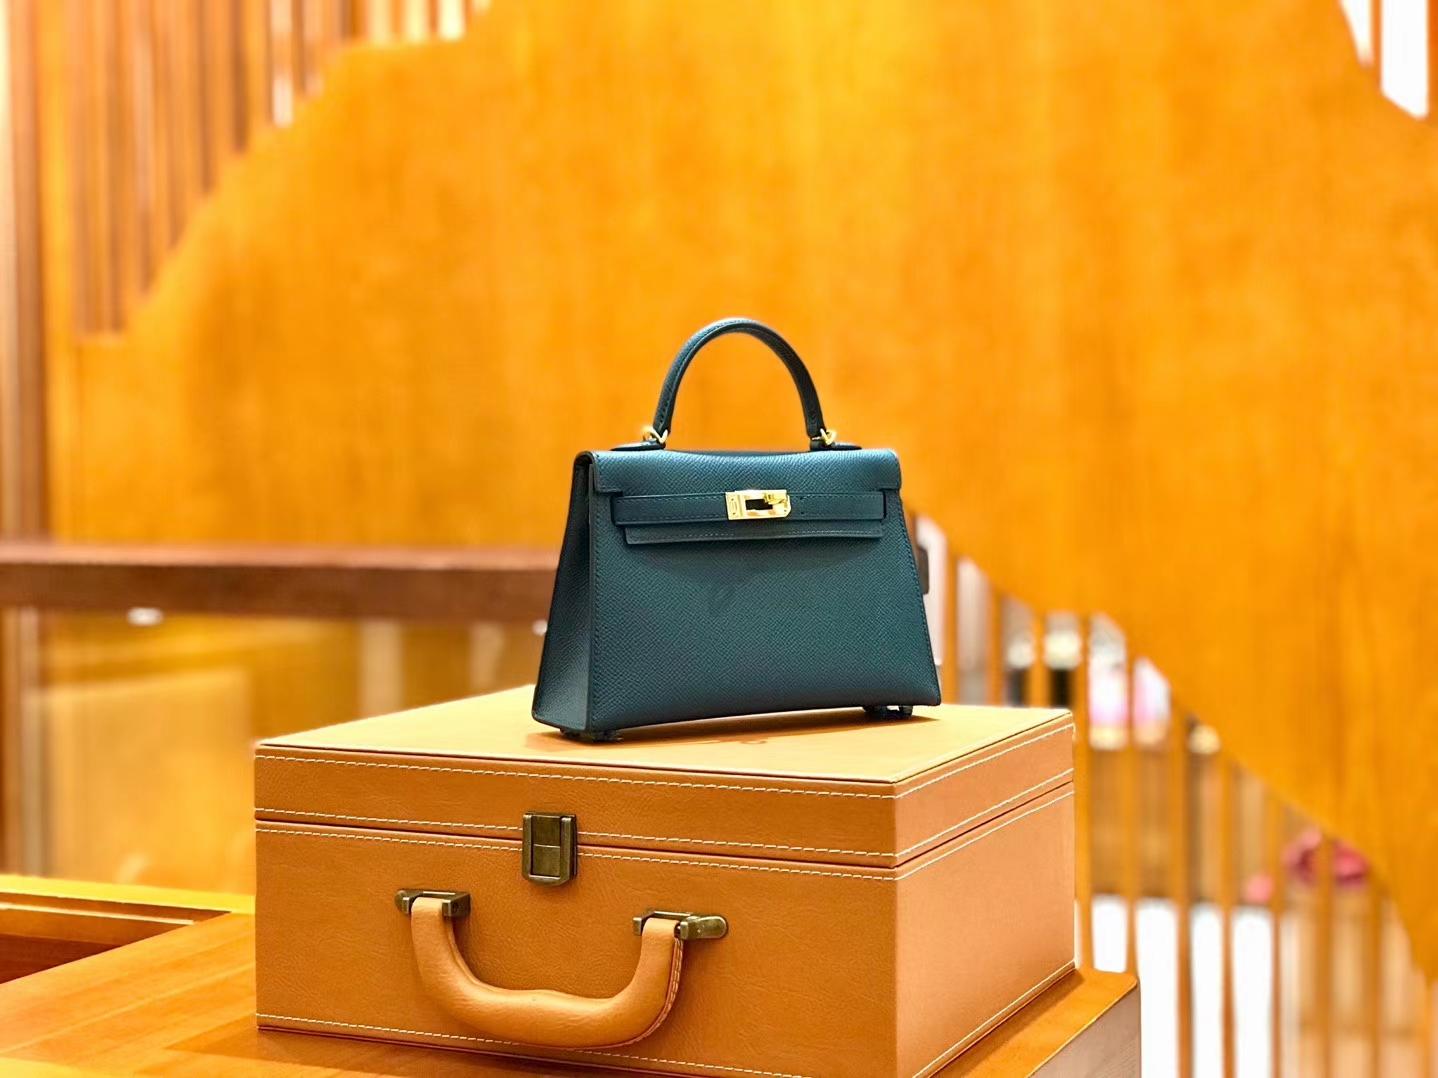 Hermès(爱马仕)新增现货 2代 19cm 蜥蜴皮 伊滋蜜尔蓝 金扣 全手工缝制